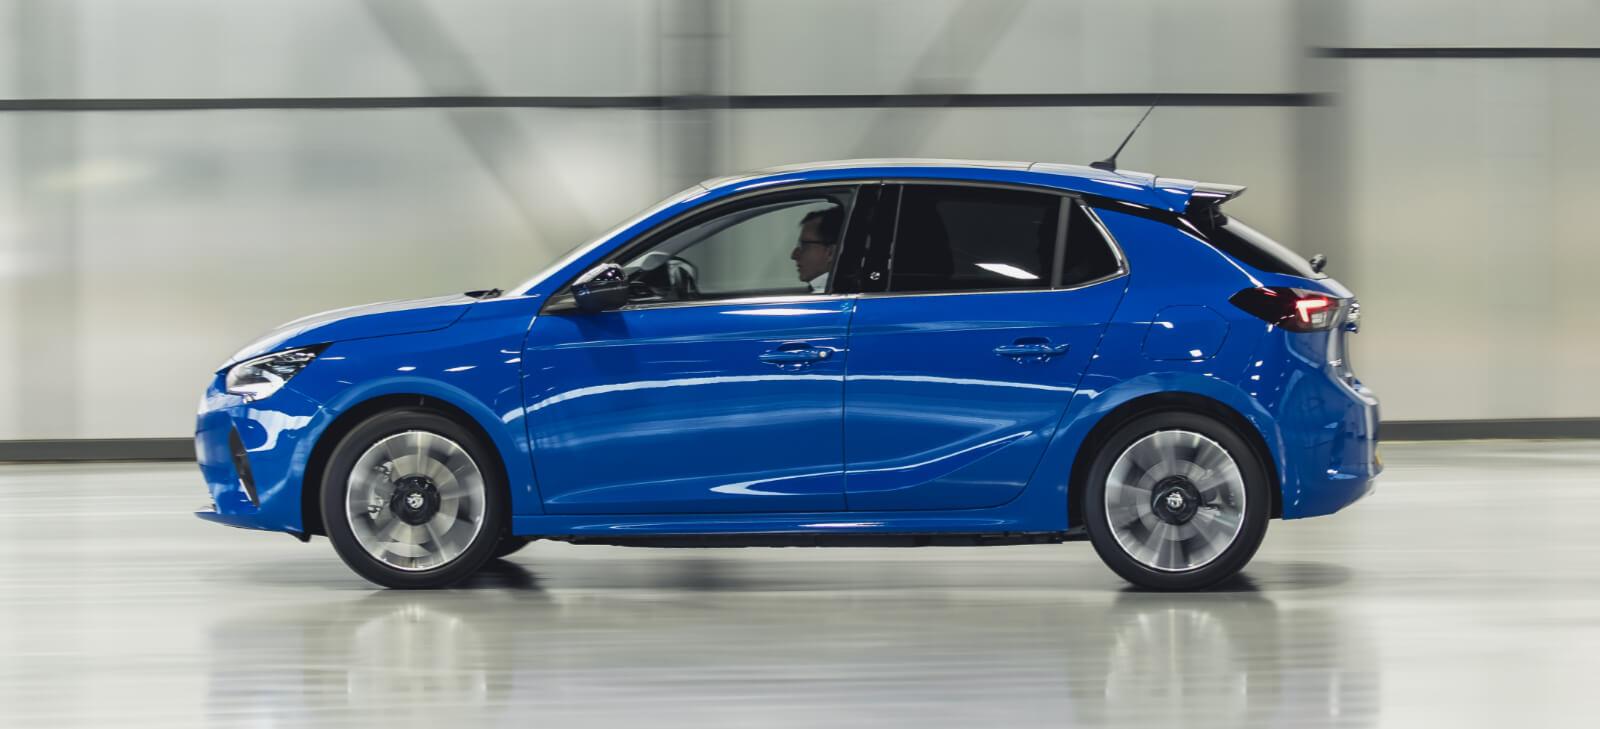 Vauxhall Corsa-e Electric Car